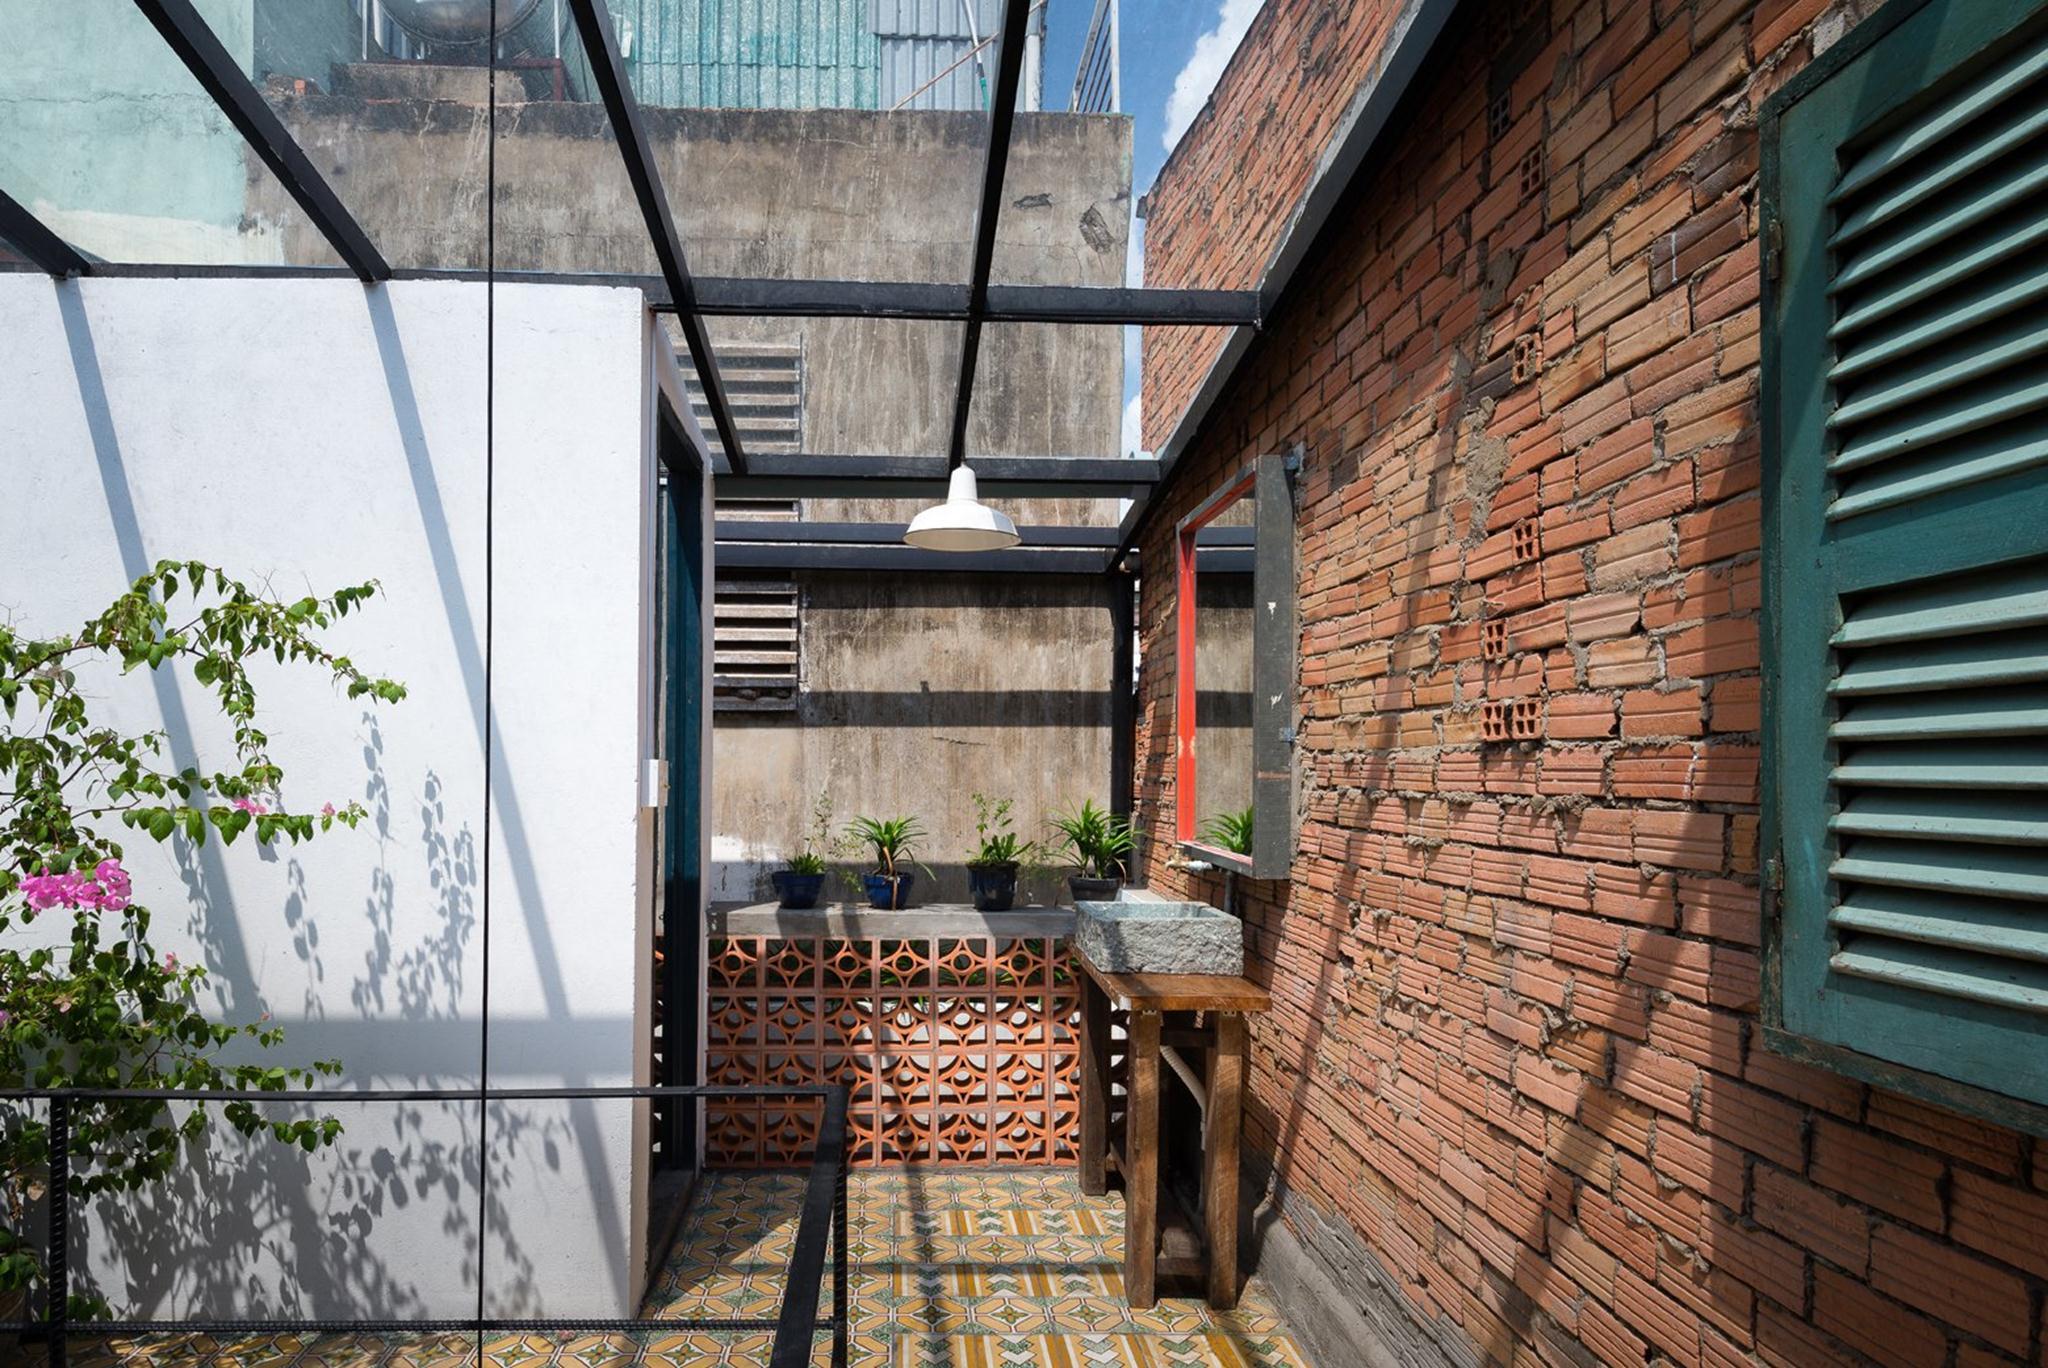 557a5b1be58eced6280001f9_vegan-house-block-architects_17 (Copy)